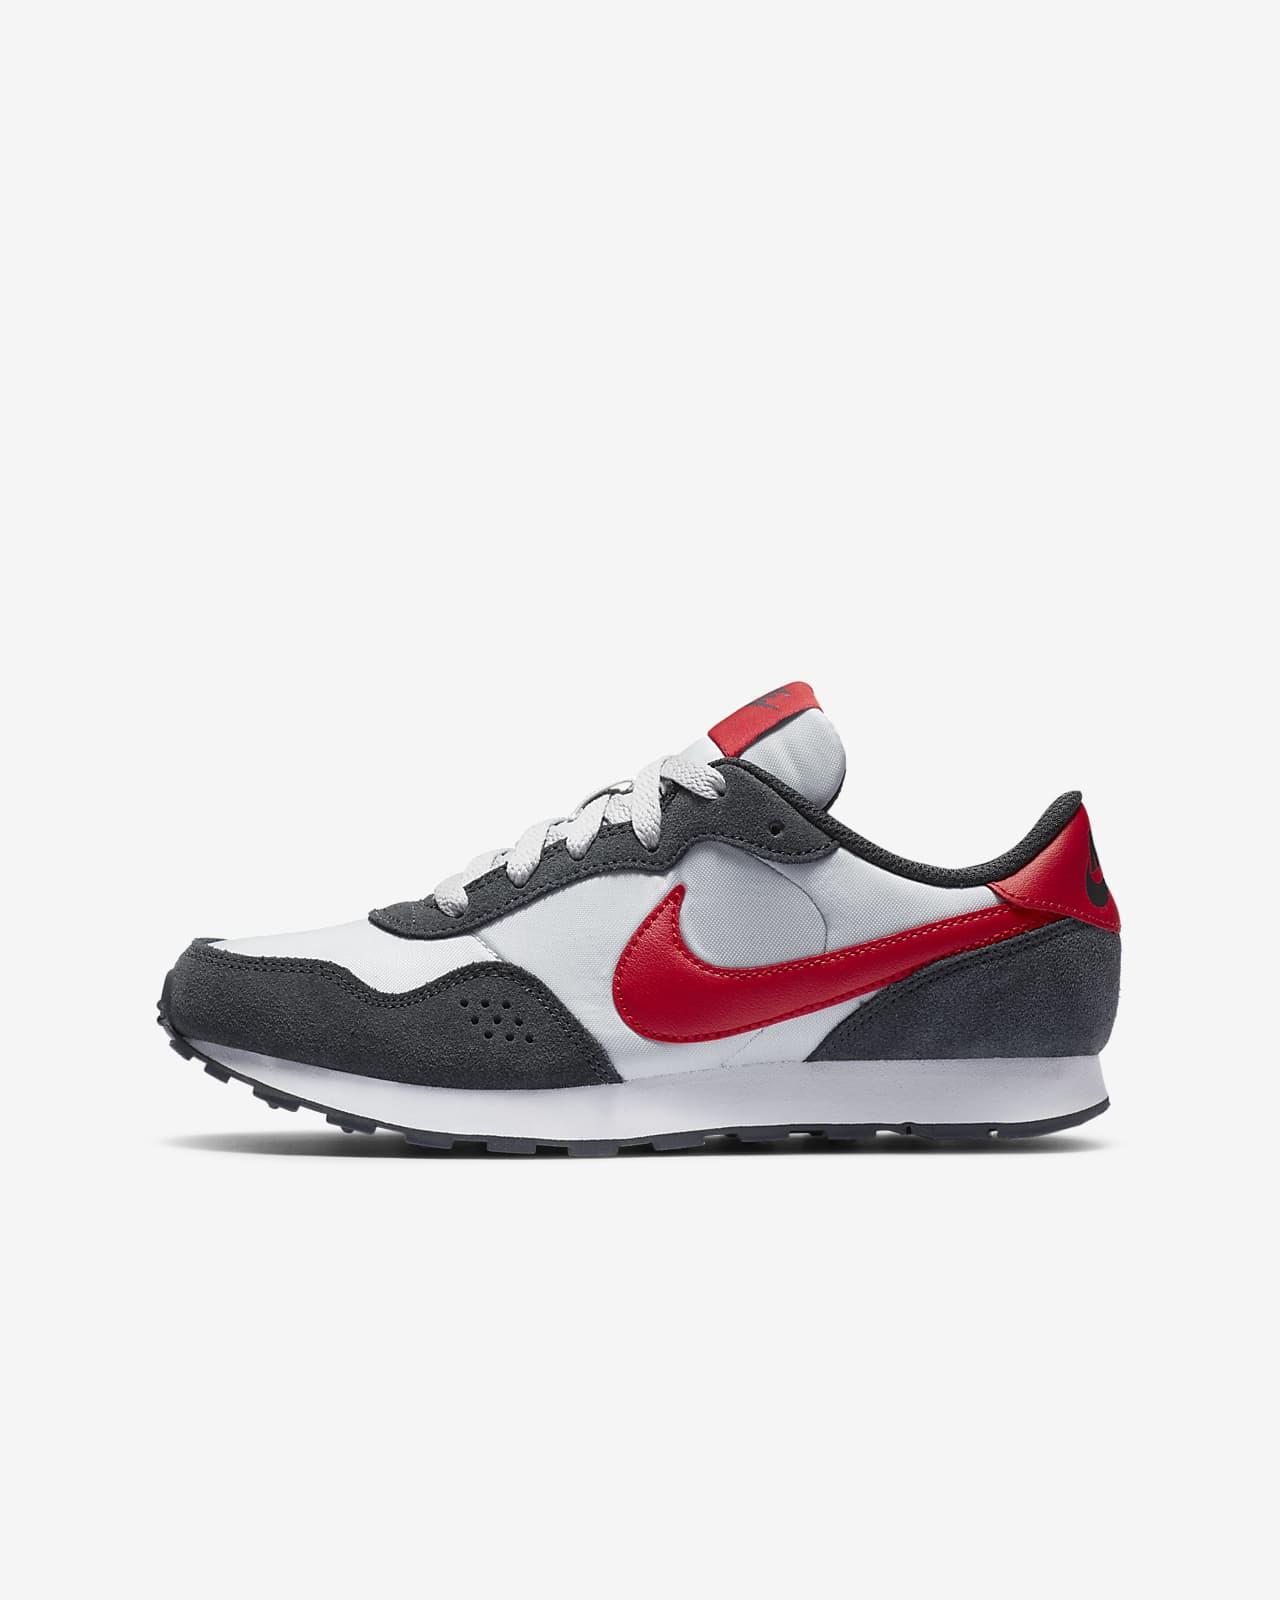 Nike MD Valiant Schuh für ältere Kinder